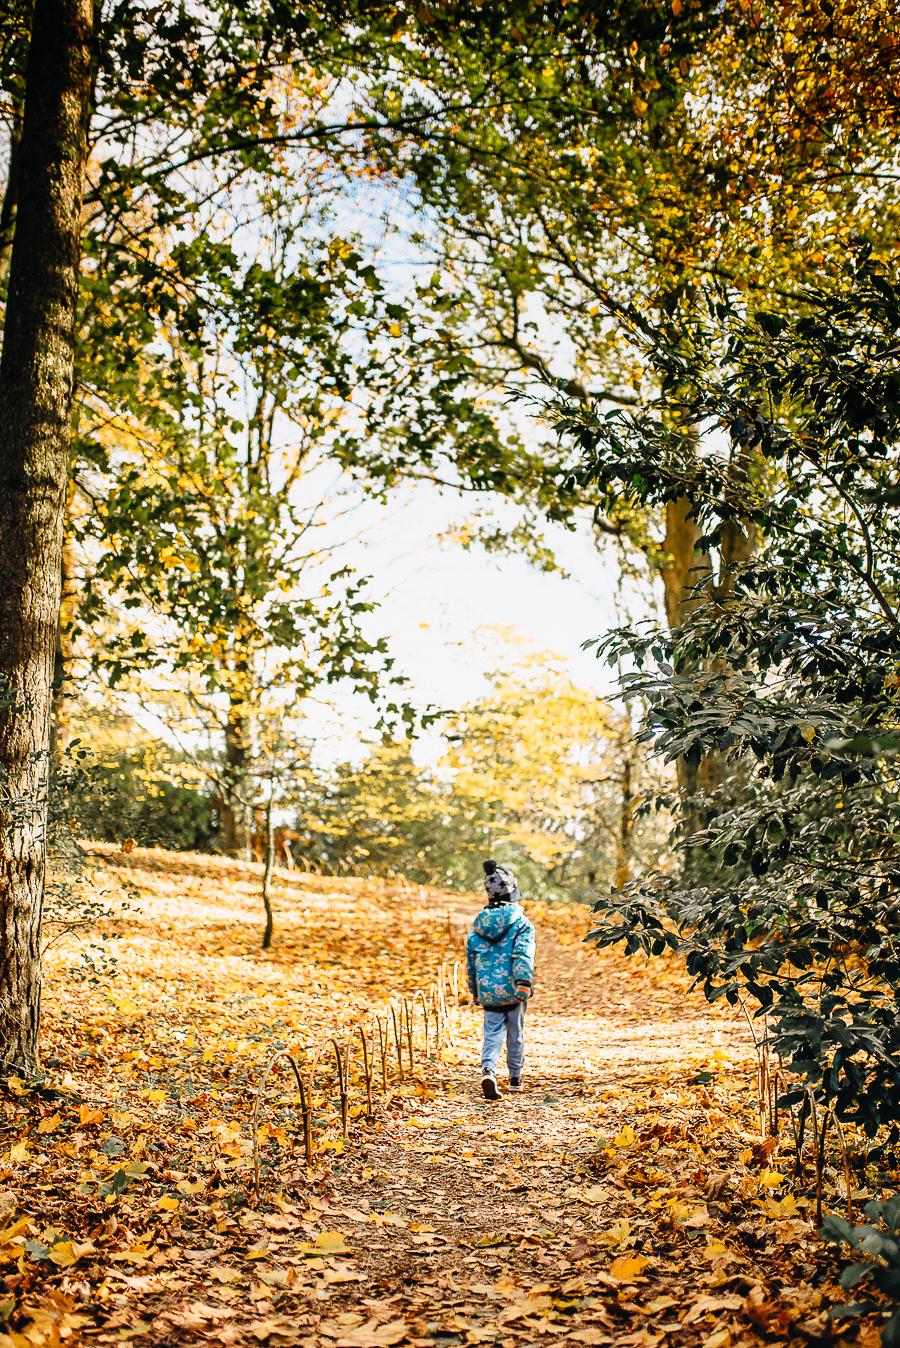 OurBeautifulAdventure-GettingOutdoorsinWales-October-websize-0306.jpg